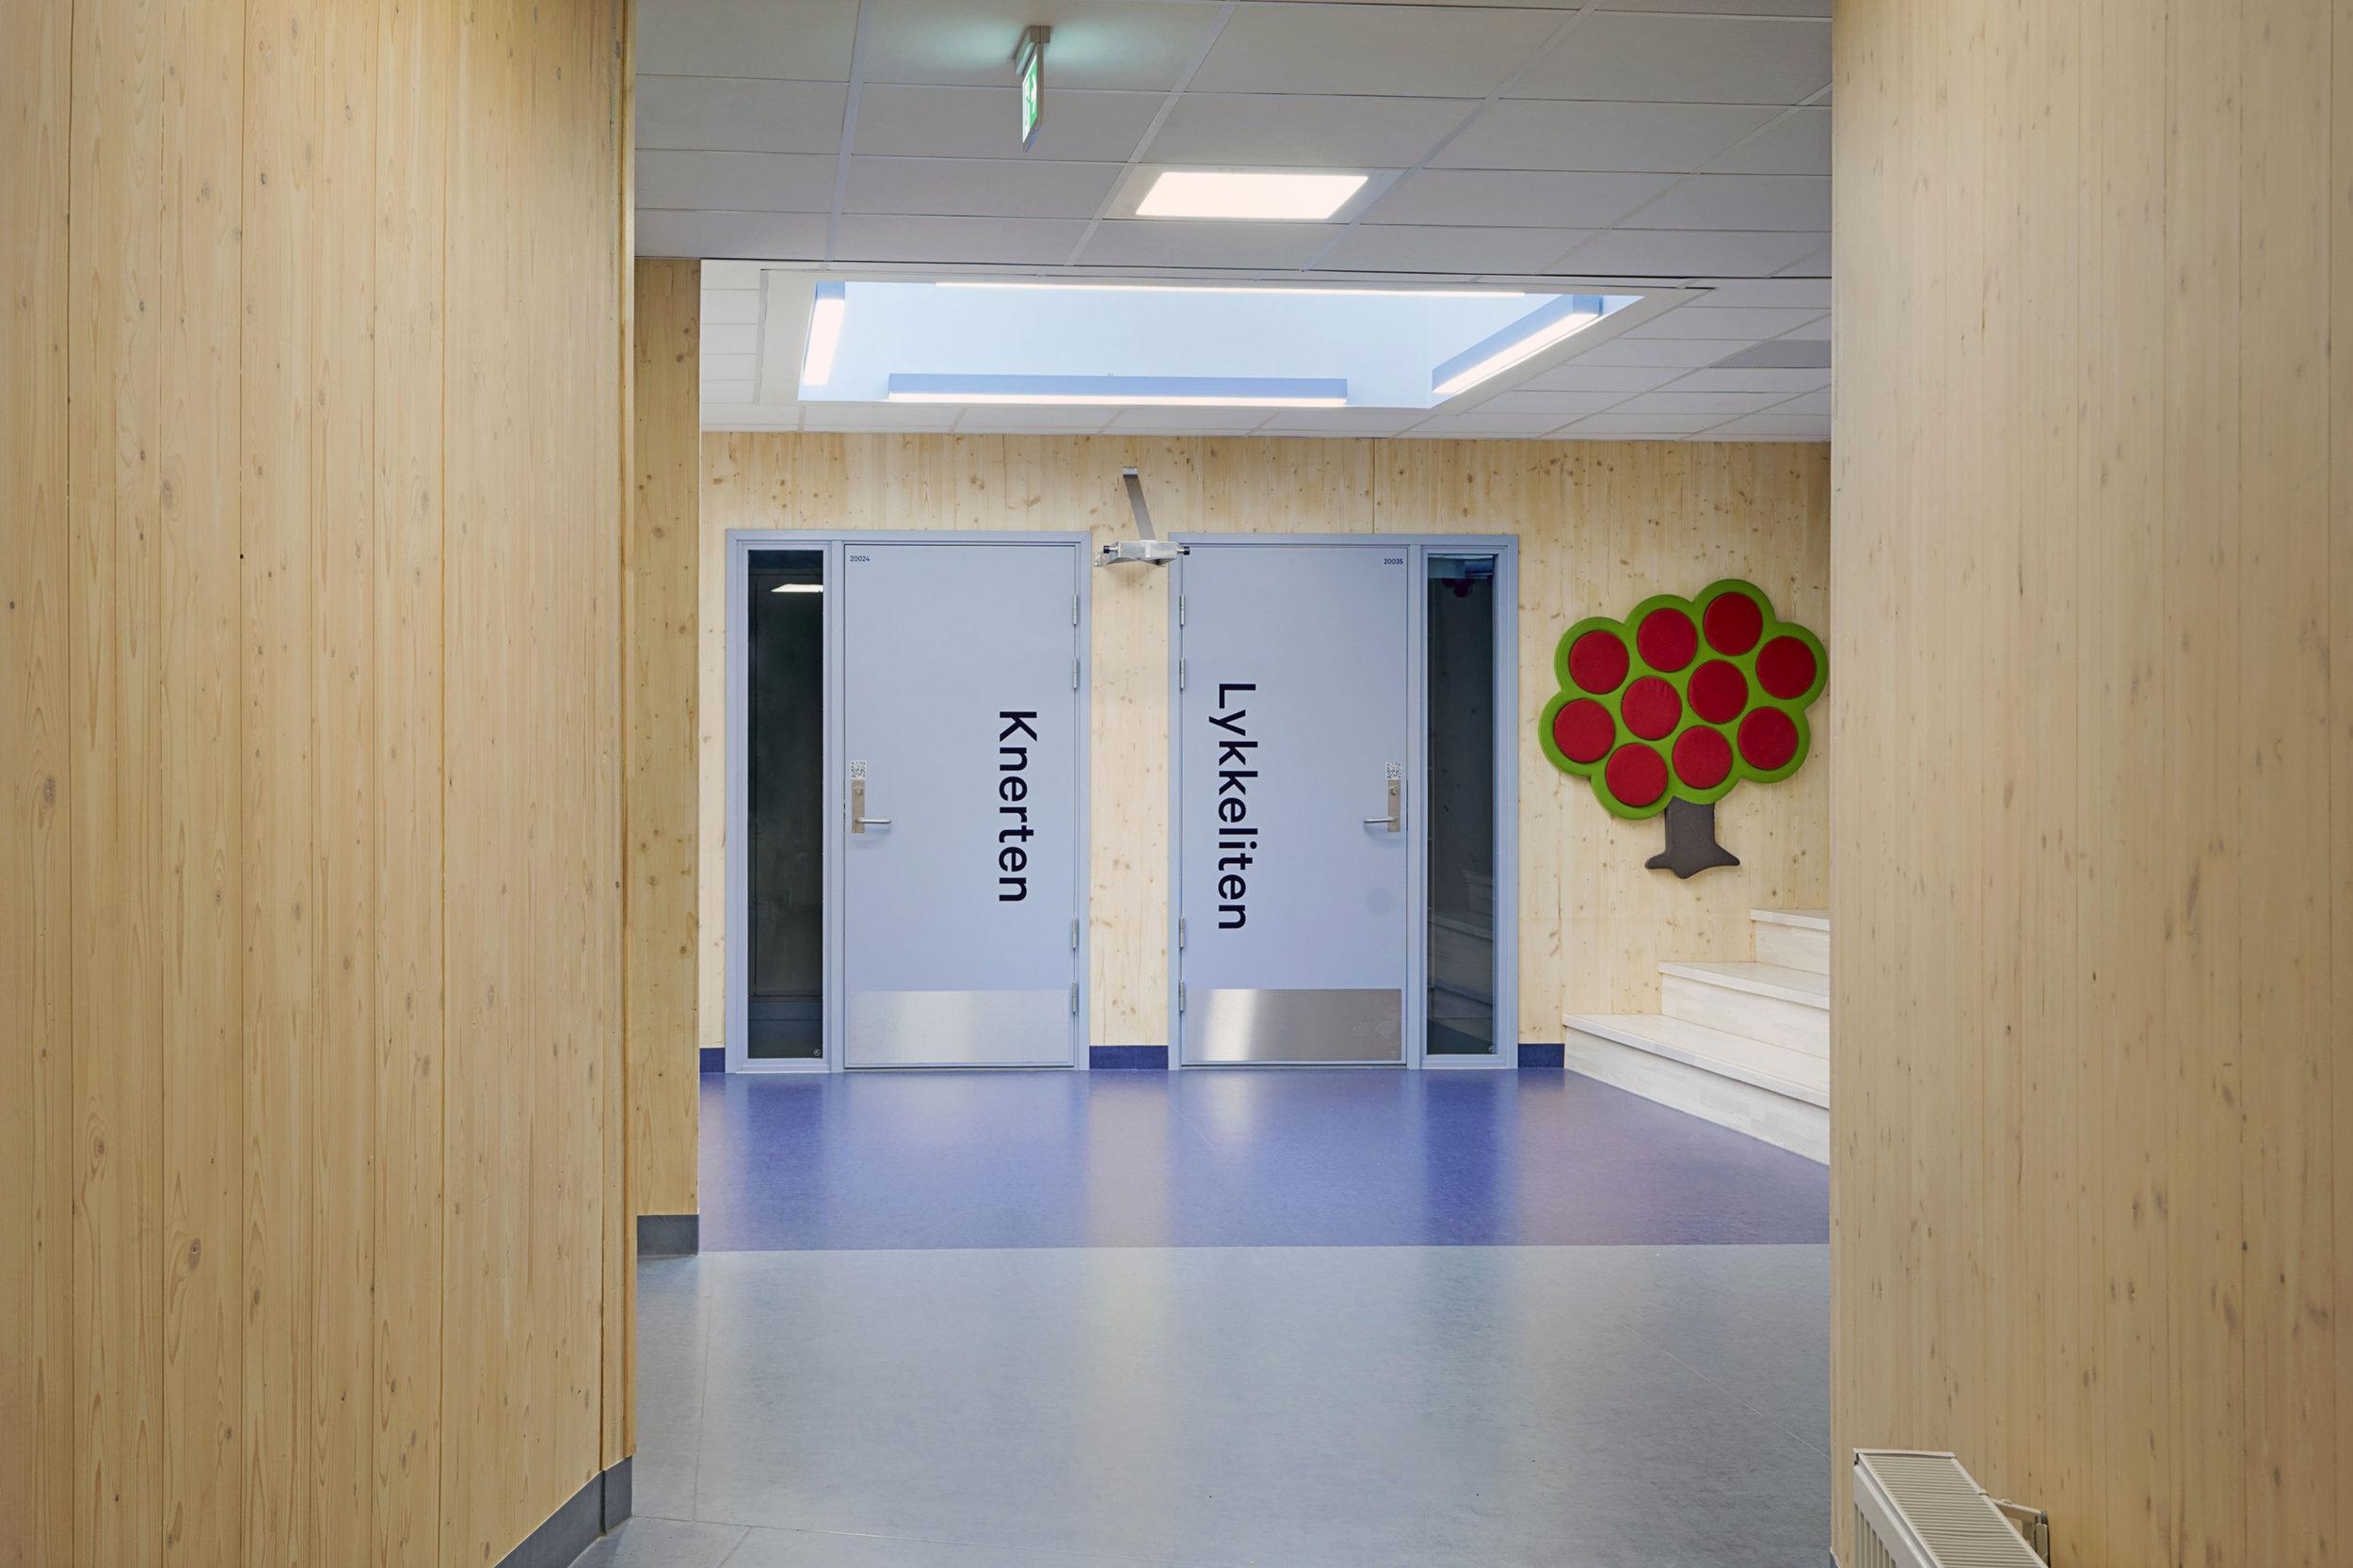 Planforum Arkitekter_Ytre Enebakk skole_Foto Eli Haugen Sandnes_Garderobe 05.jpg